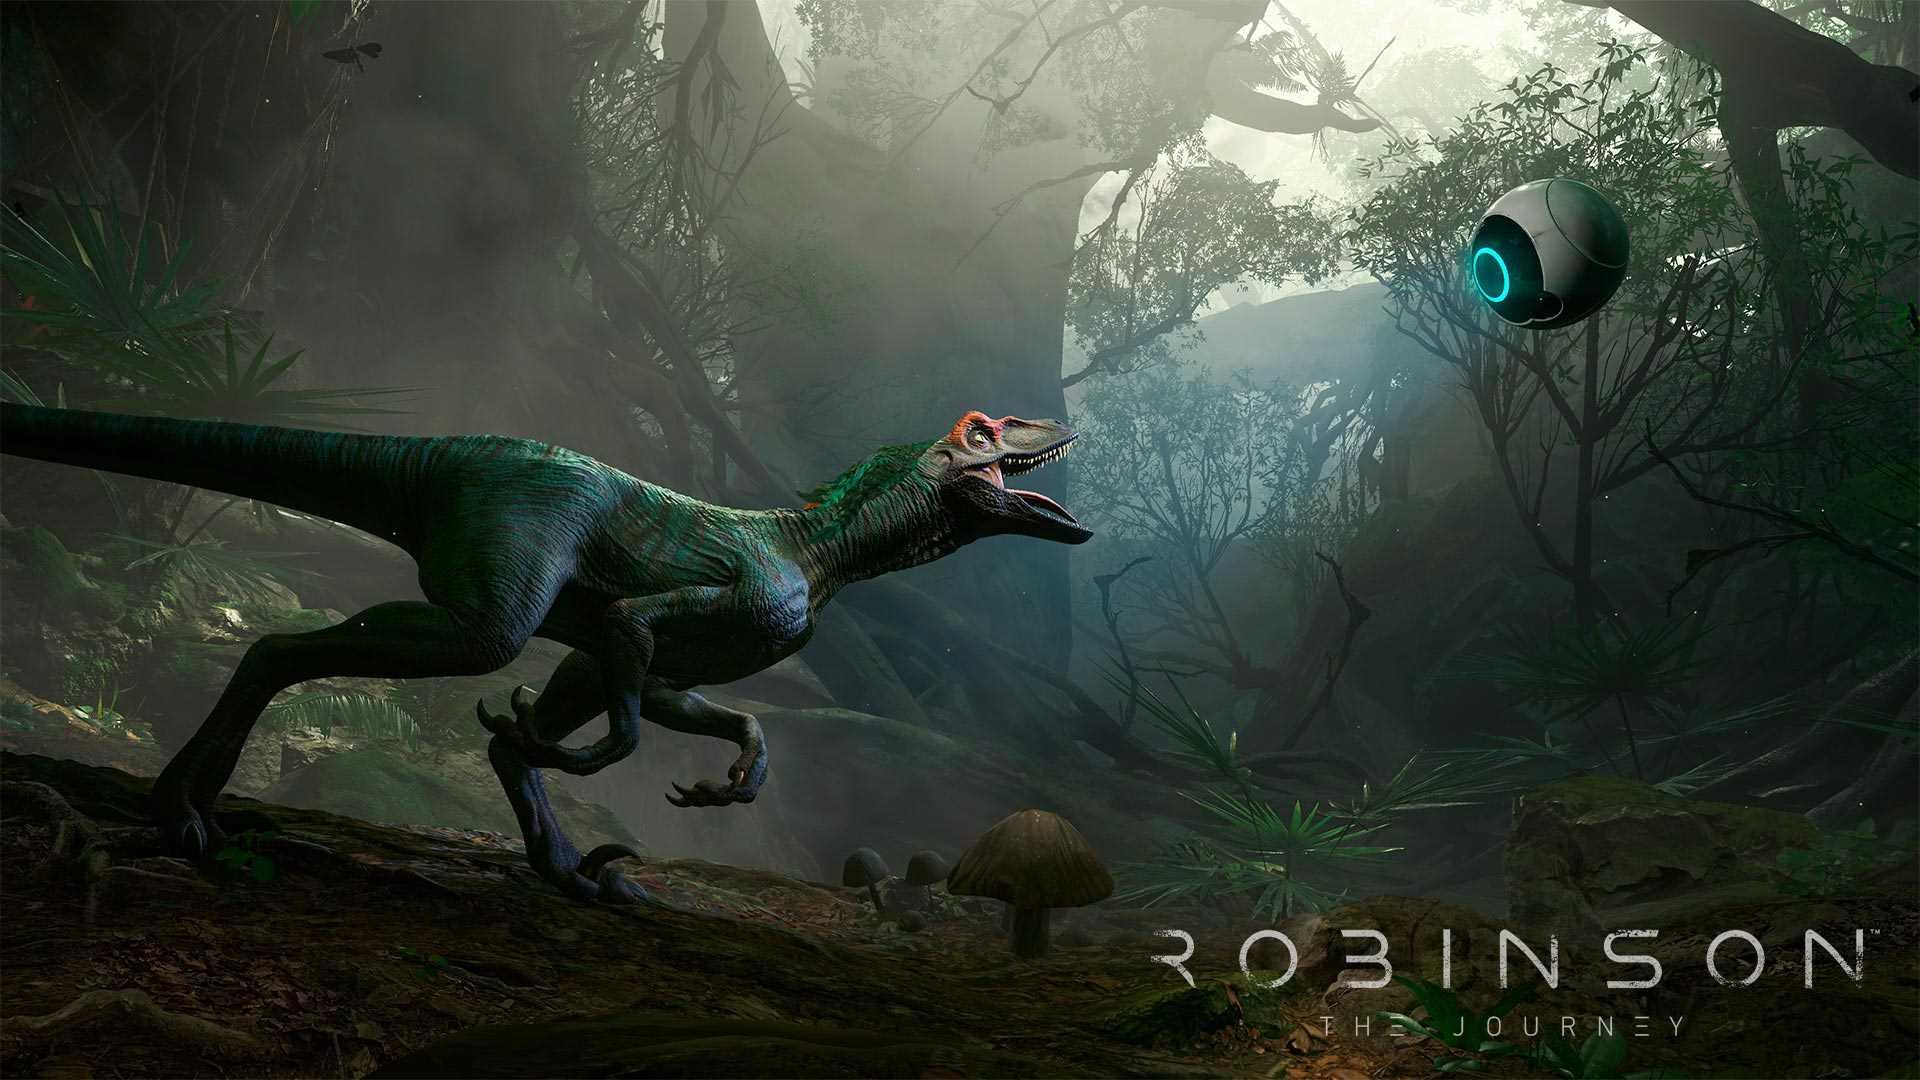 Robinson_The_Journey_screenshot_Raptors_HIGS